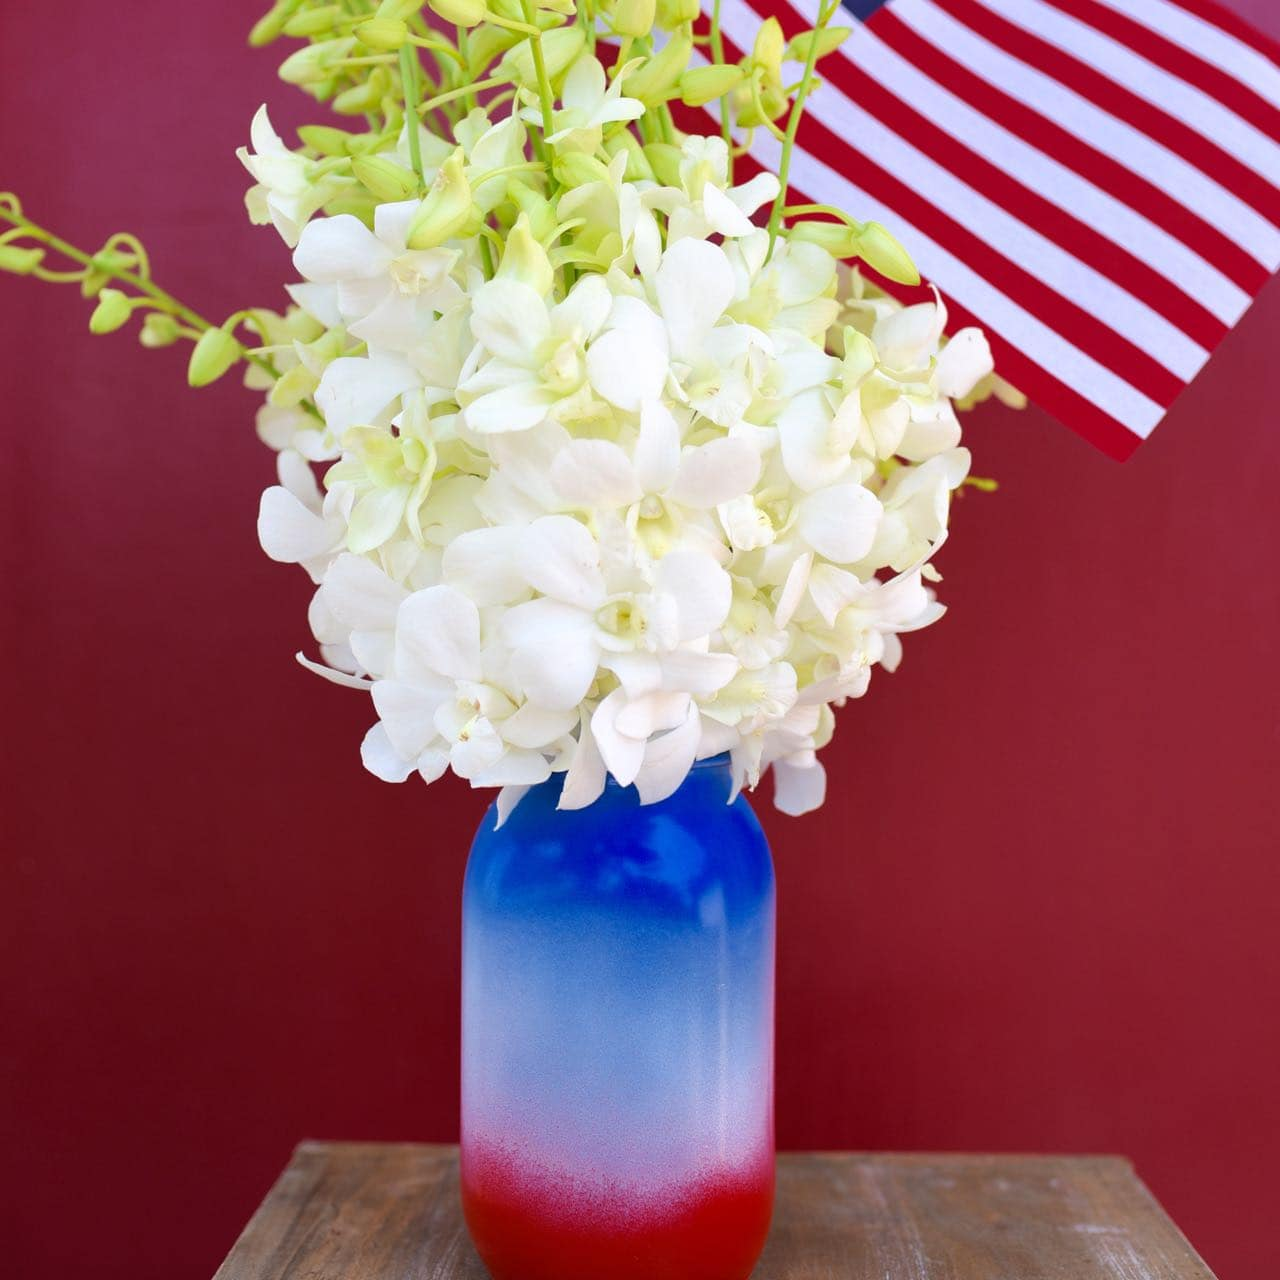 DIY mason jar vase Fourth of July craft